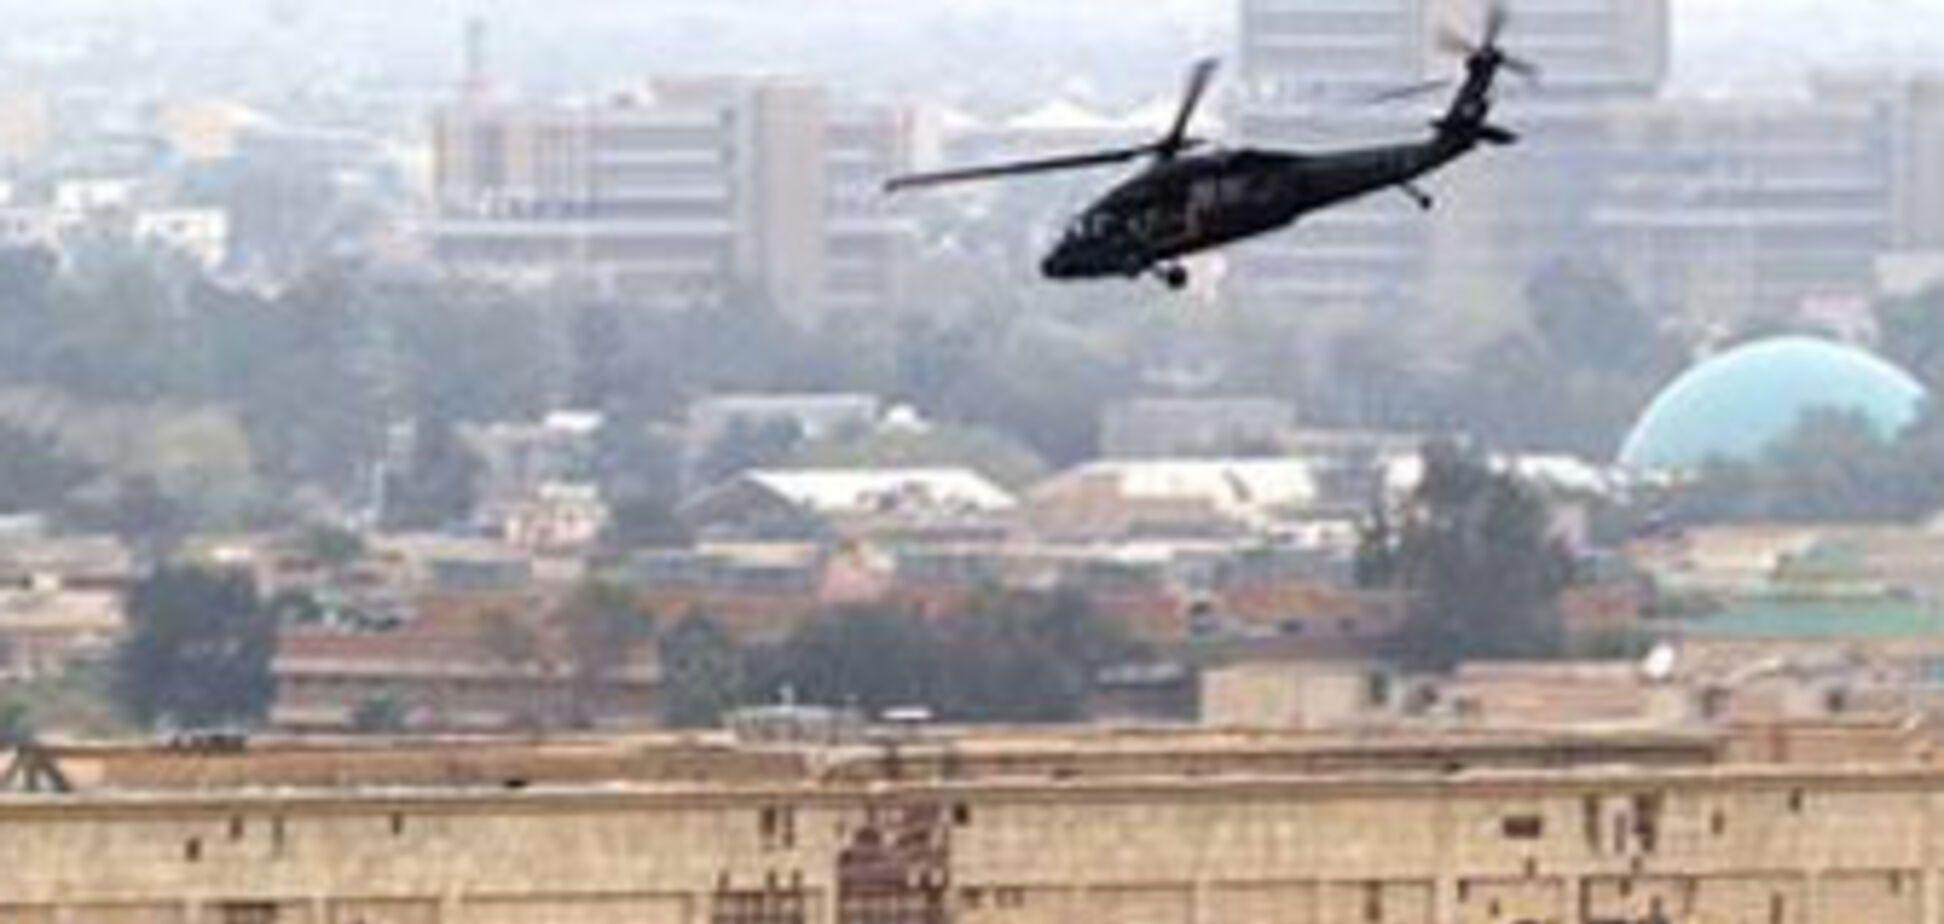 Безпечна зона Багдада піддалася обстрілу